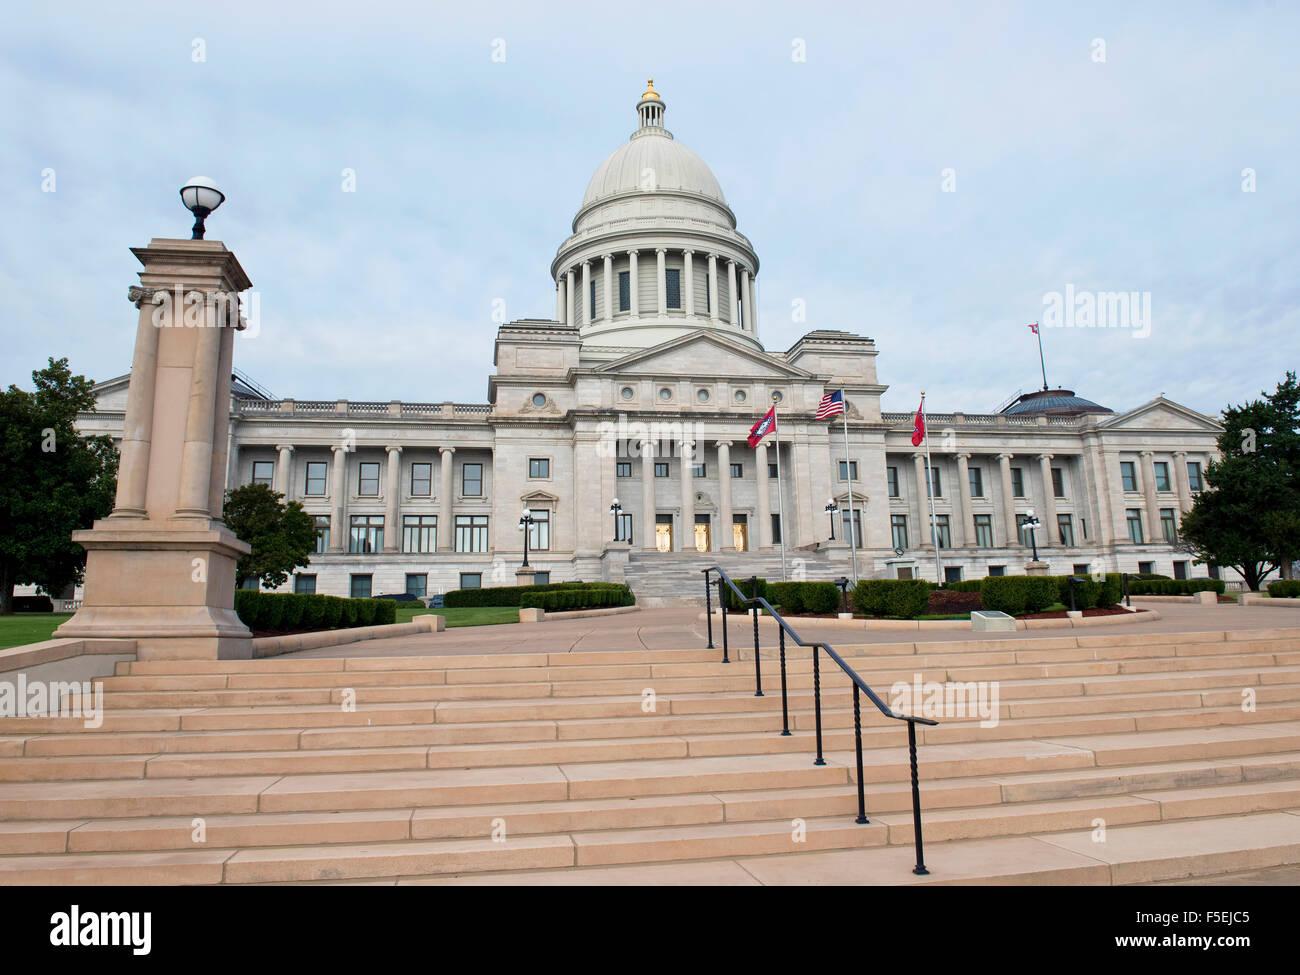 Arkansas state capitol dome stock photos arkansas state capitol state capital building in little rock arkansas stock image malvernweather Gallery